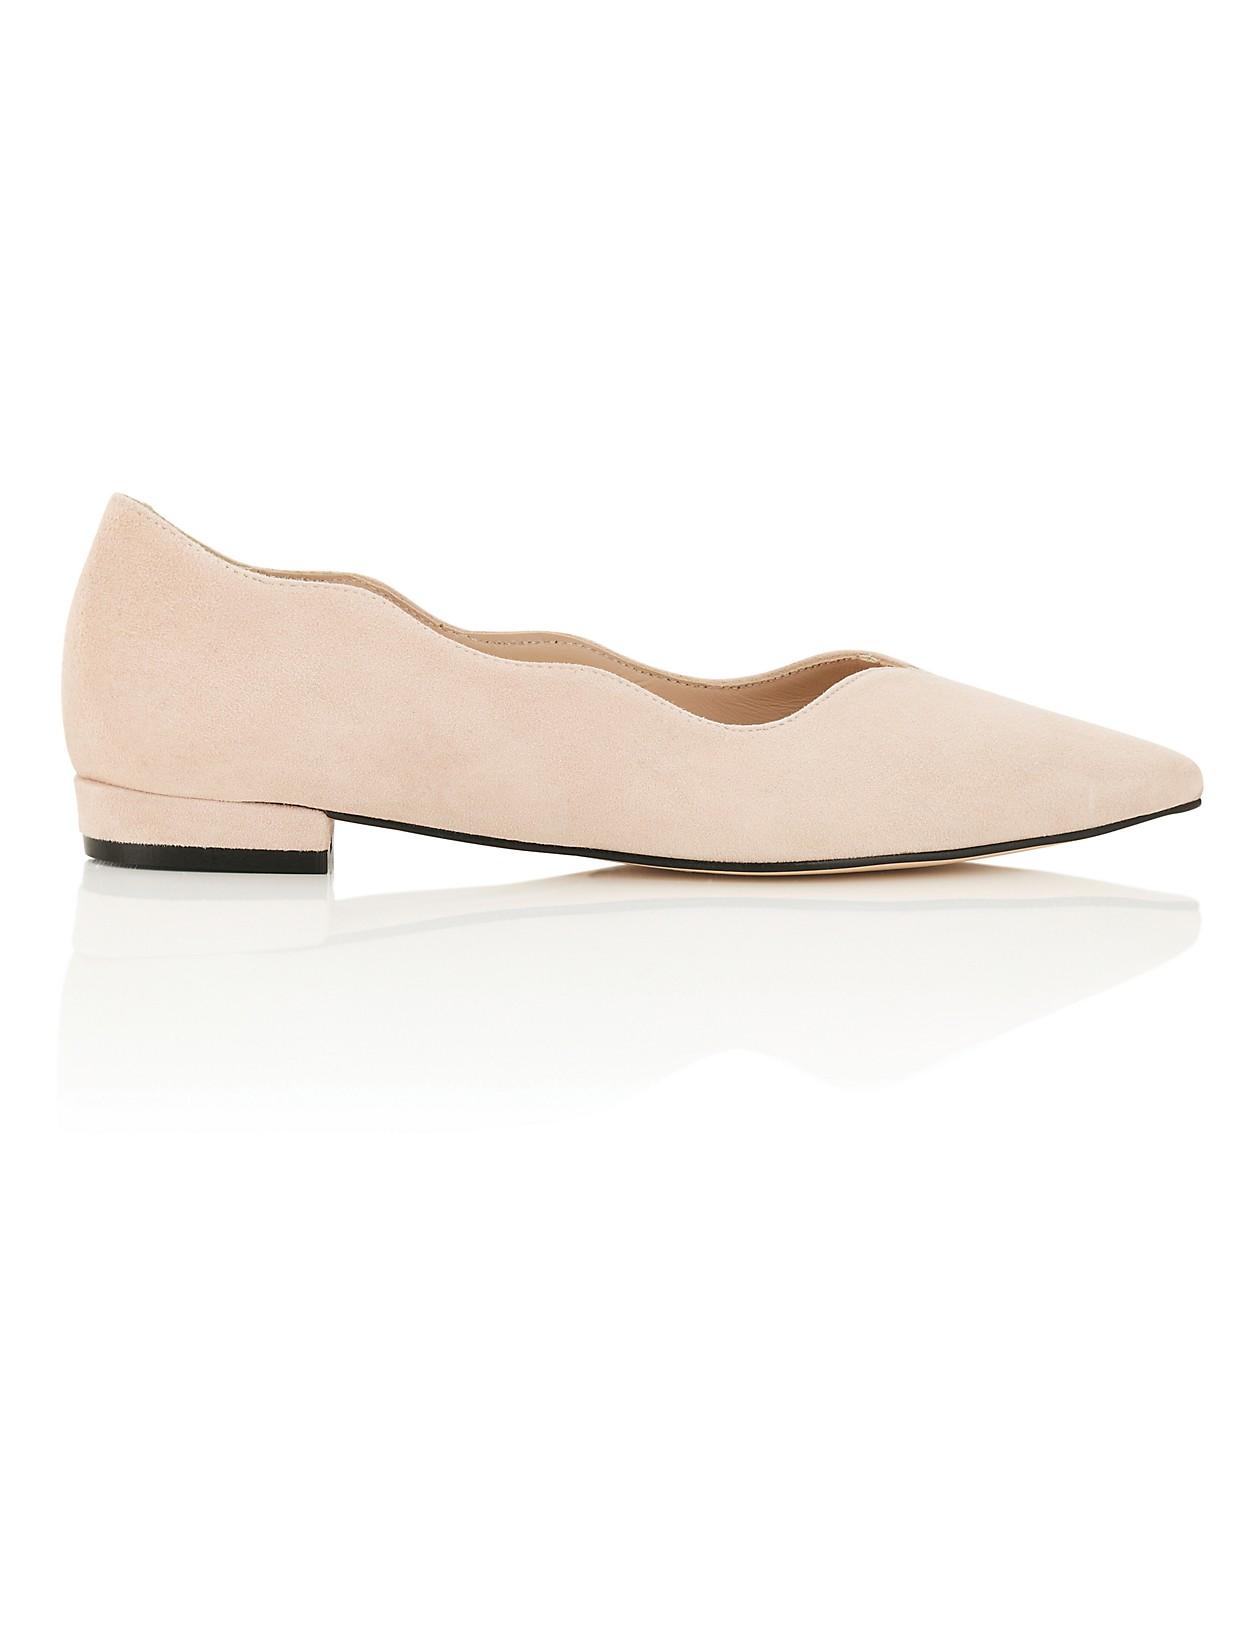 separation shoes 179b8 22a25 Ballerina aus Velours-Leder in spitz zulaufender Form ...